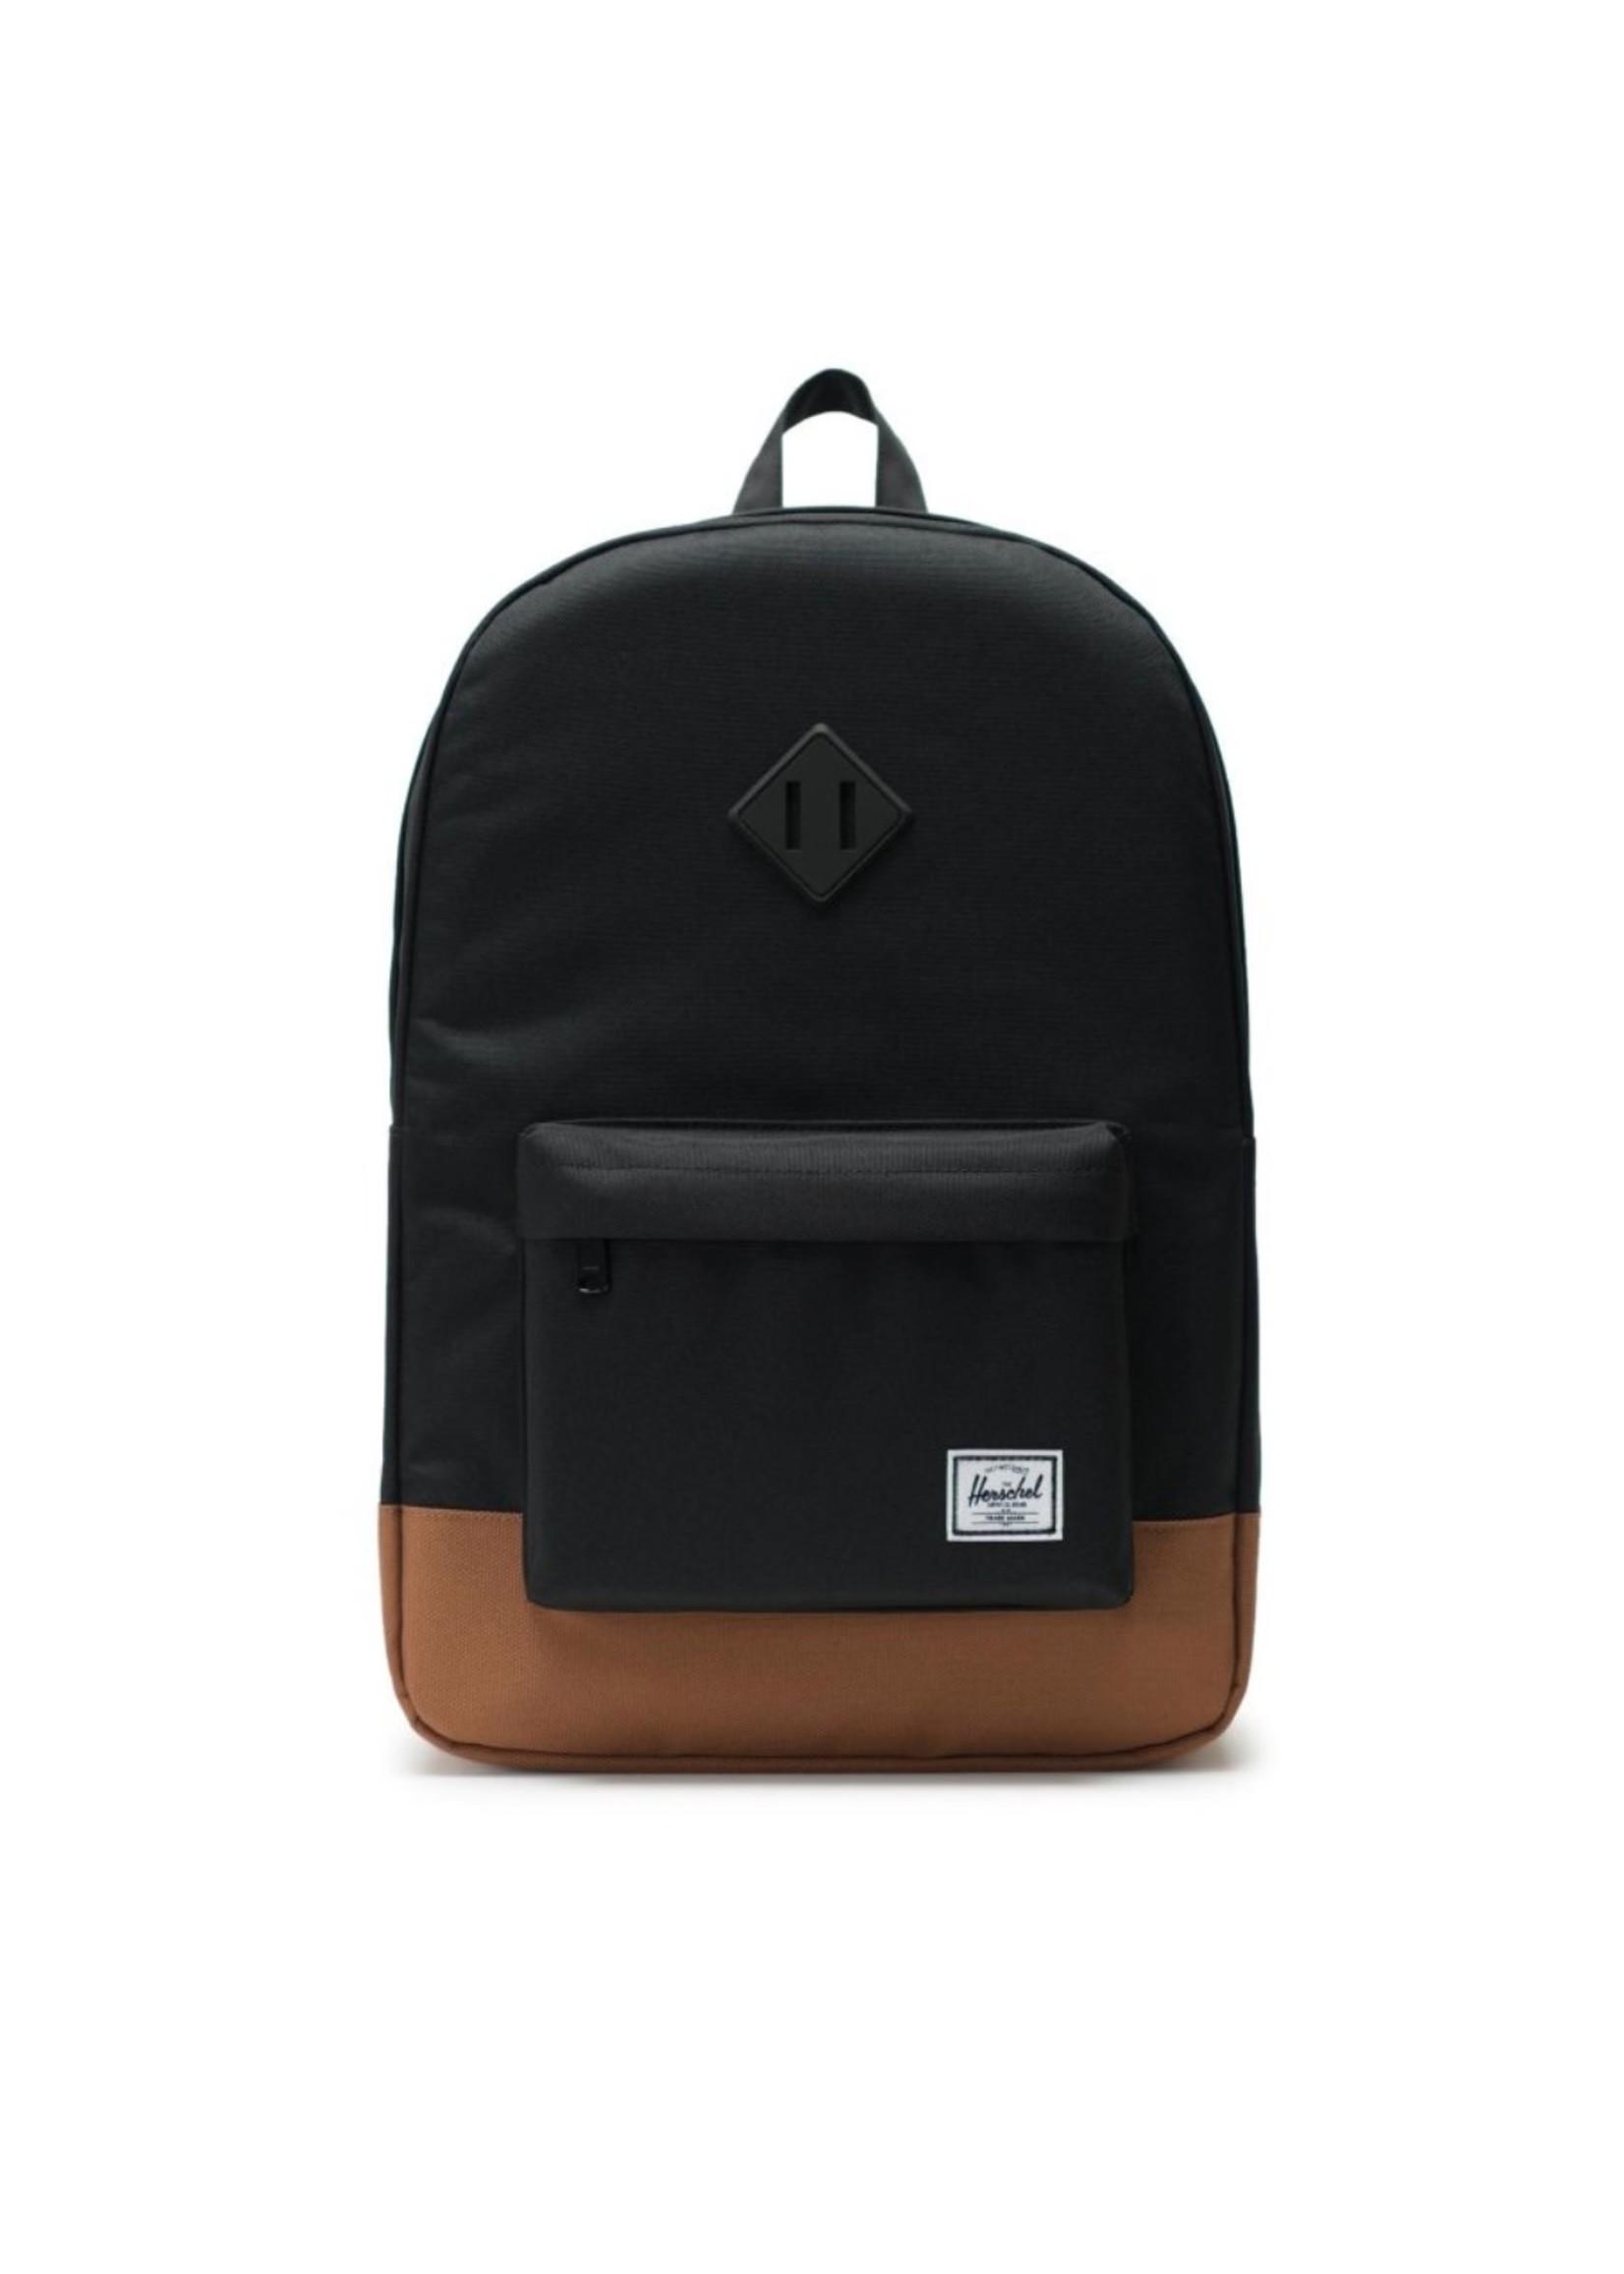 Herschel Supply Co. Heritage Backpack   Youth XL, Black/Saddle, 22L